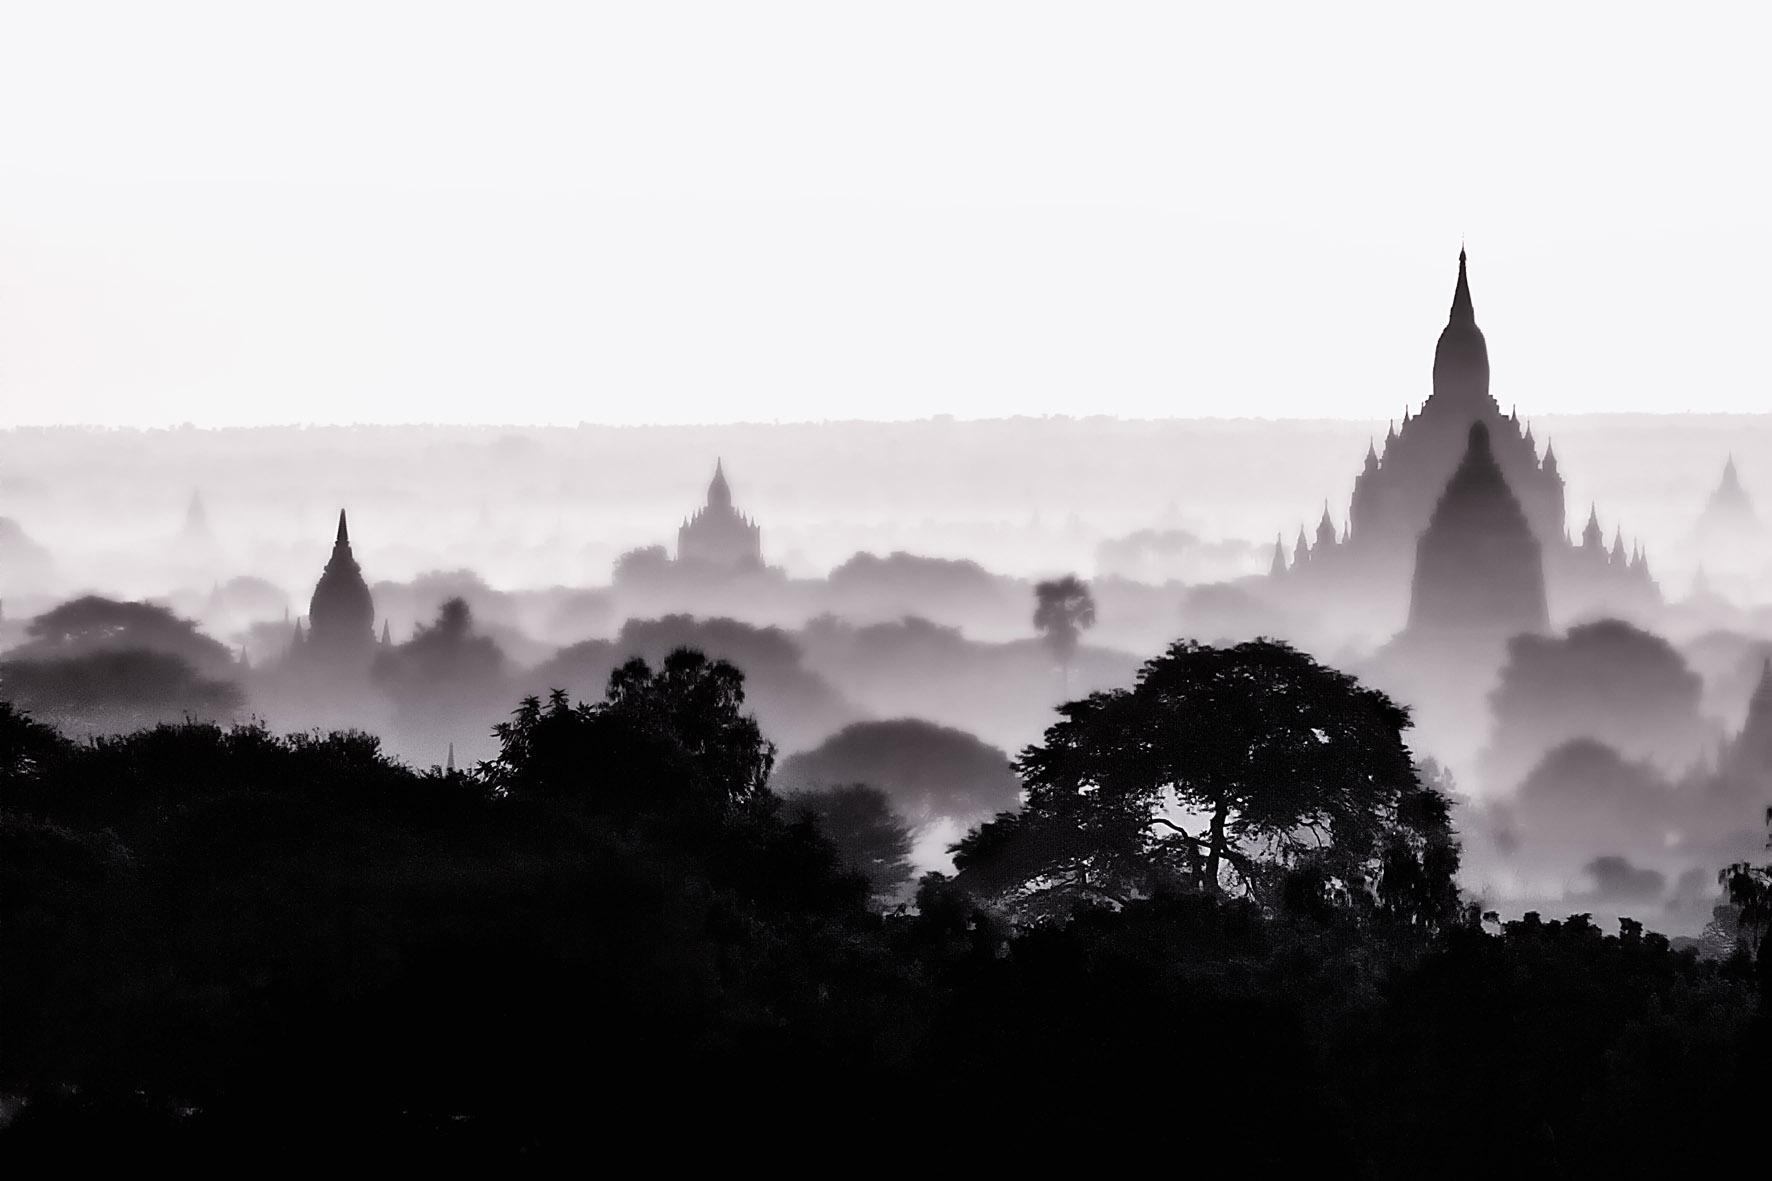 Sunrise at Bagan (Myanmar) from Myengon Pagoda